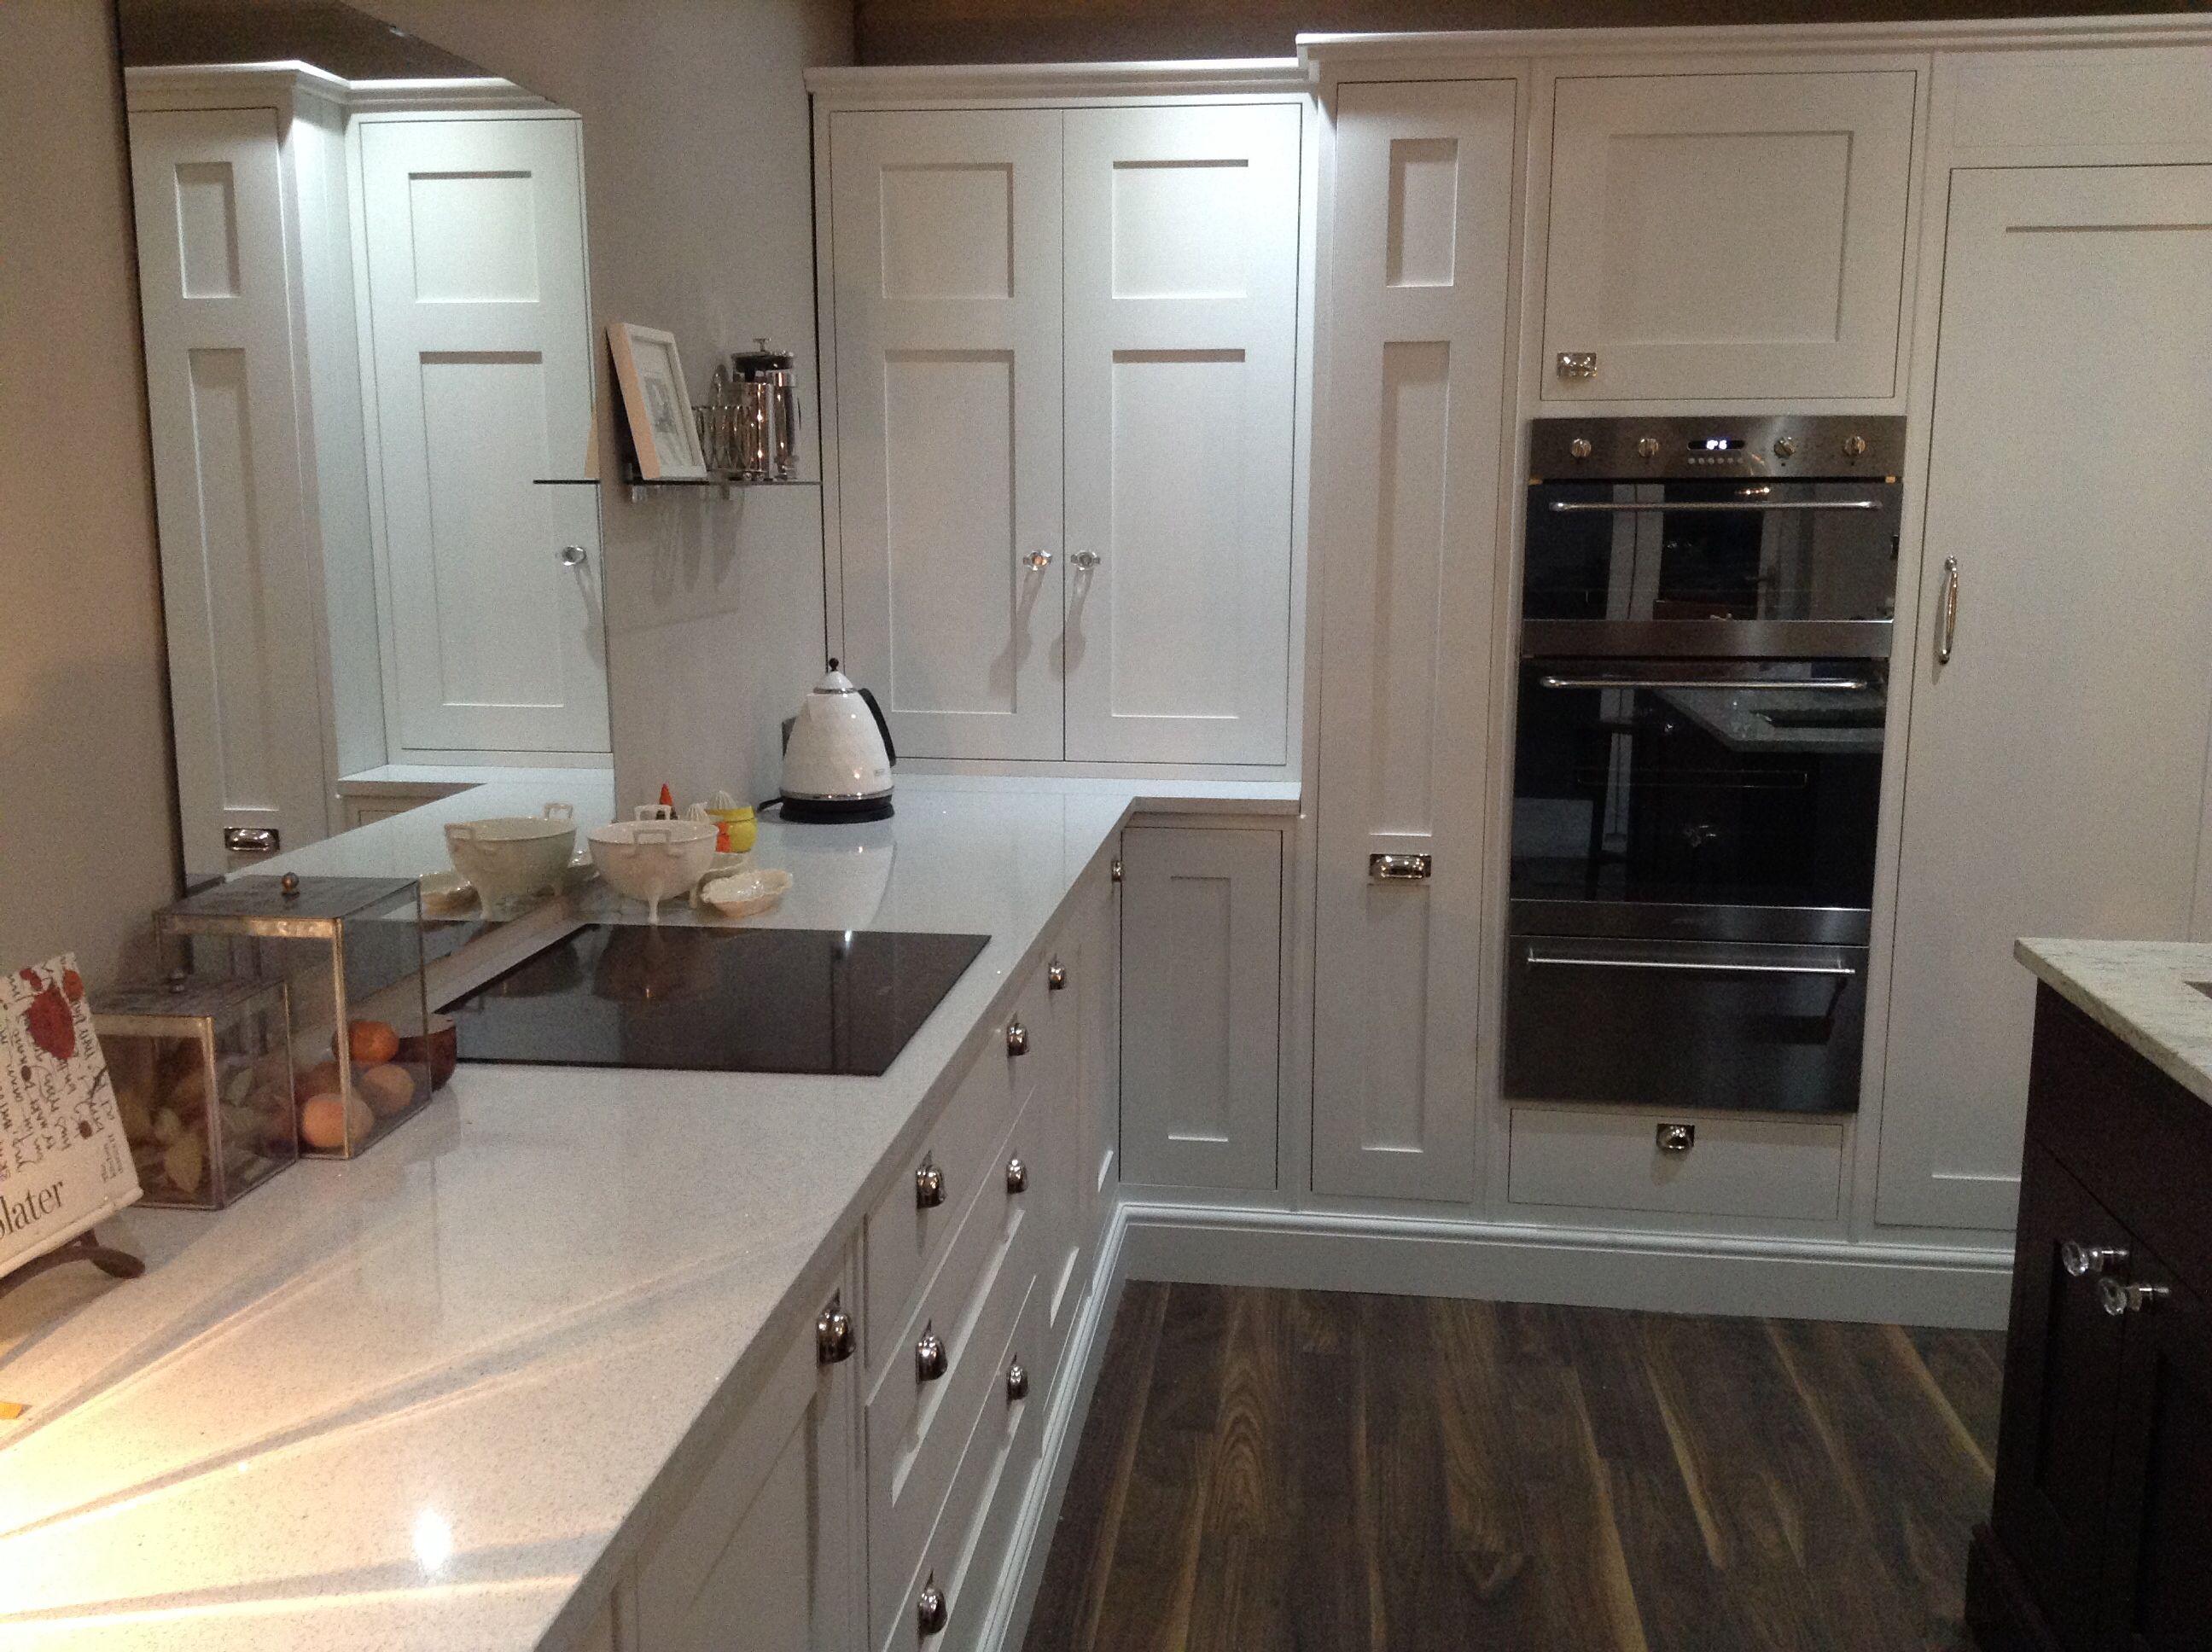 Sarah Anderson Kitchen Kitchen Inspirations Painting Cabinets Kitchen